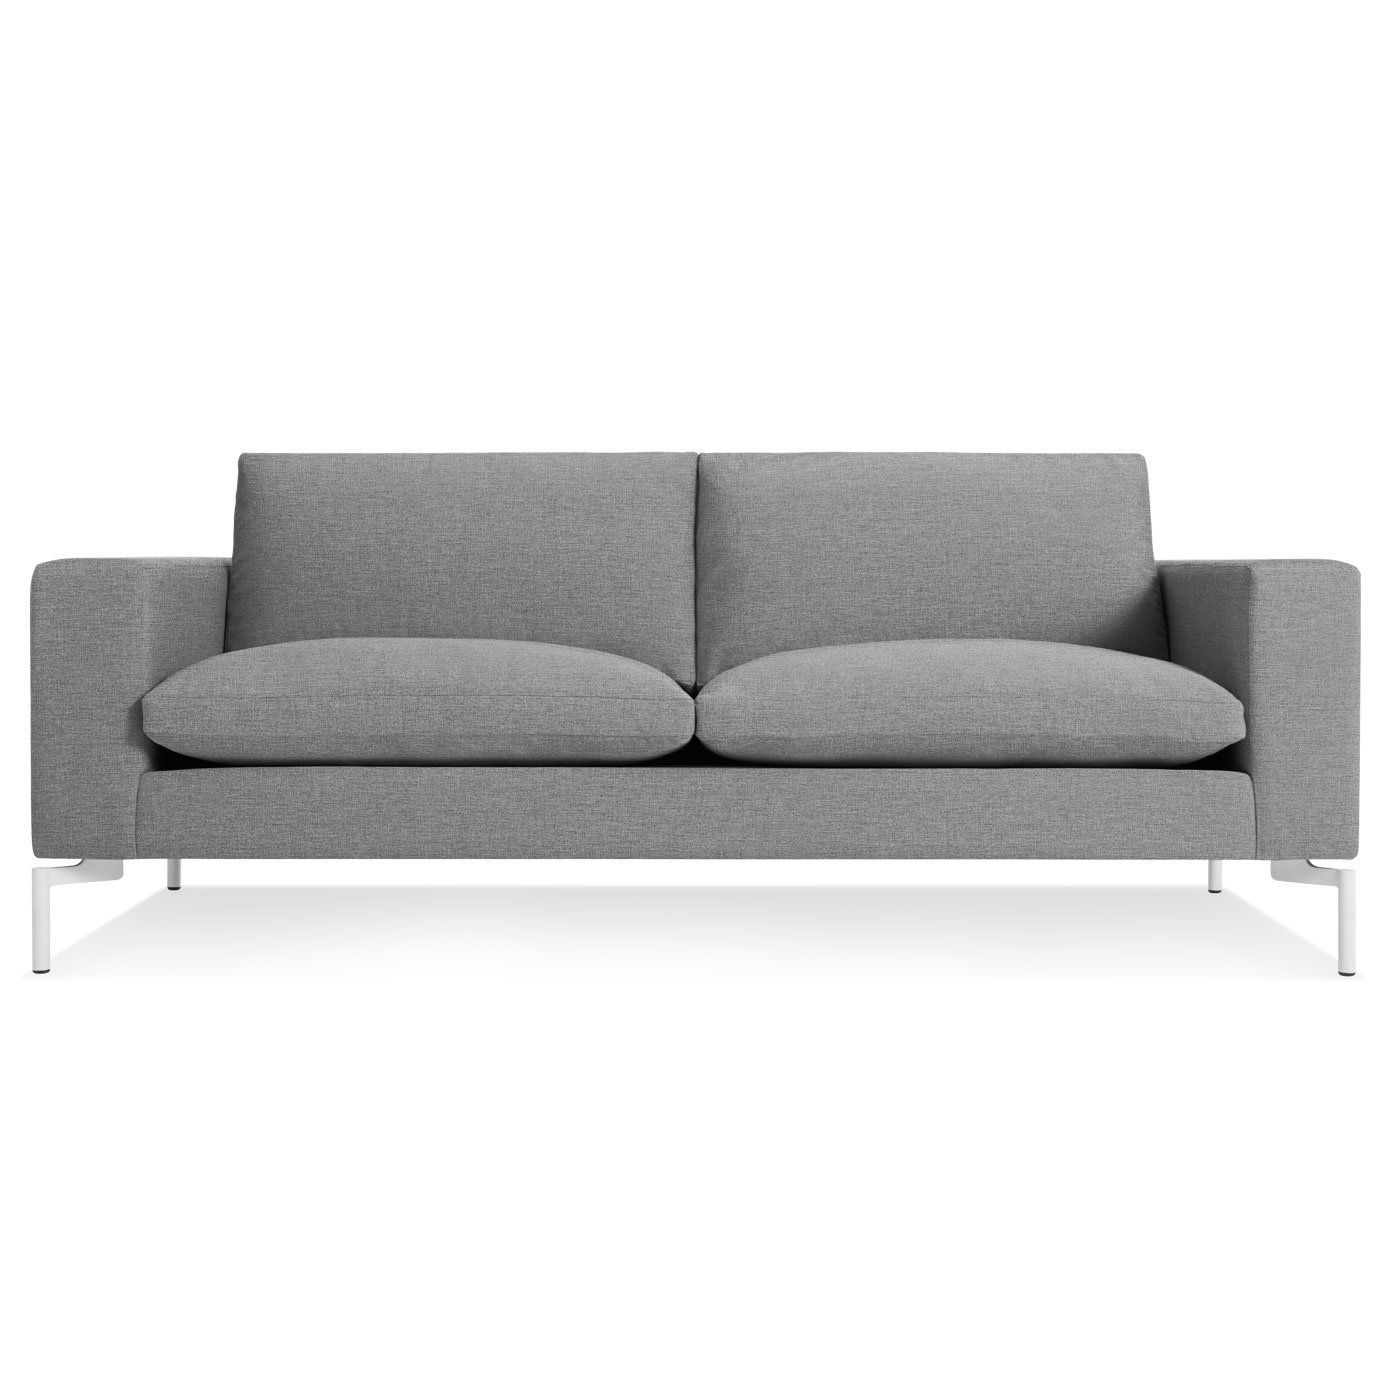 New Standard Sofa In 2020 Sofa Modular Sofa Sofa Upholstery